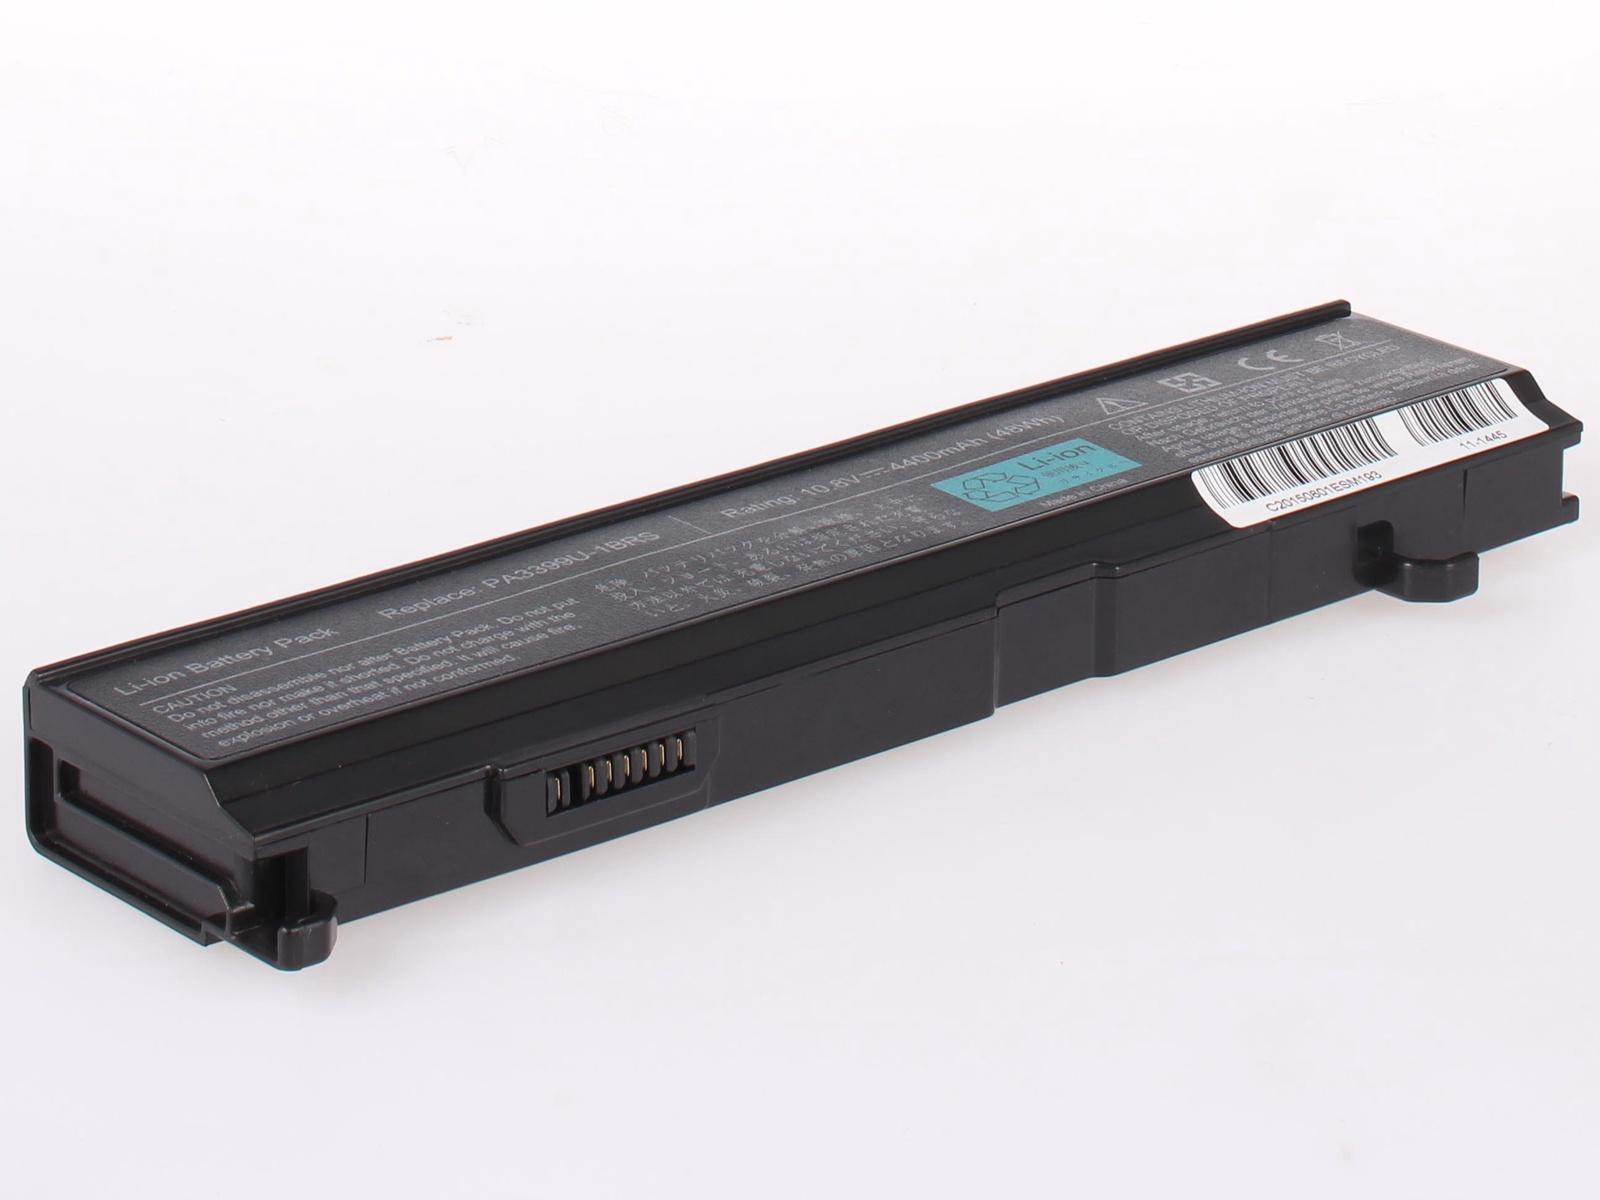 Аккумулятор для ноутбука AnyBatt для ToshiBa Satellite A100-847, Satellite A80, Satellite M70-129, Satellite A100-912, Satellite M40-294, Satellite M70-190, Satellite A100-237, Satellite A100-712, Satellite M40-110 цена